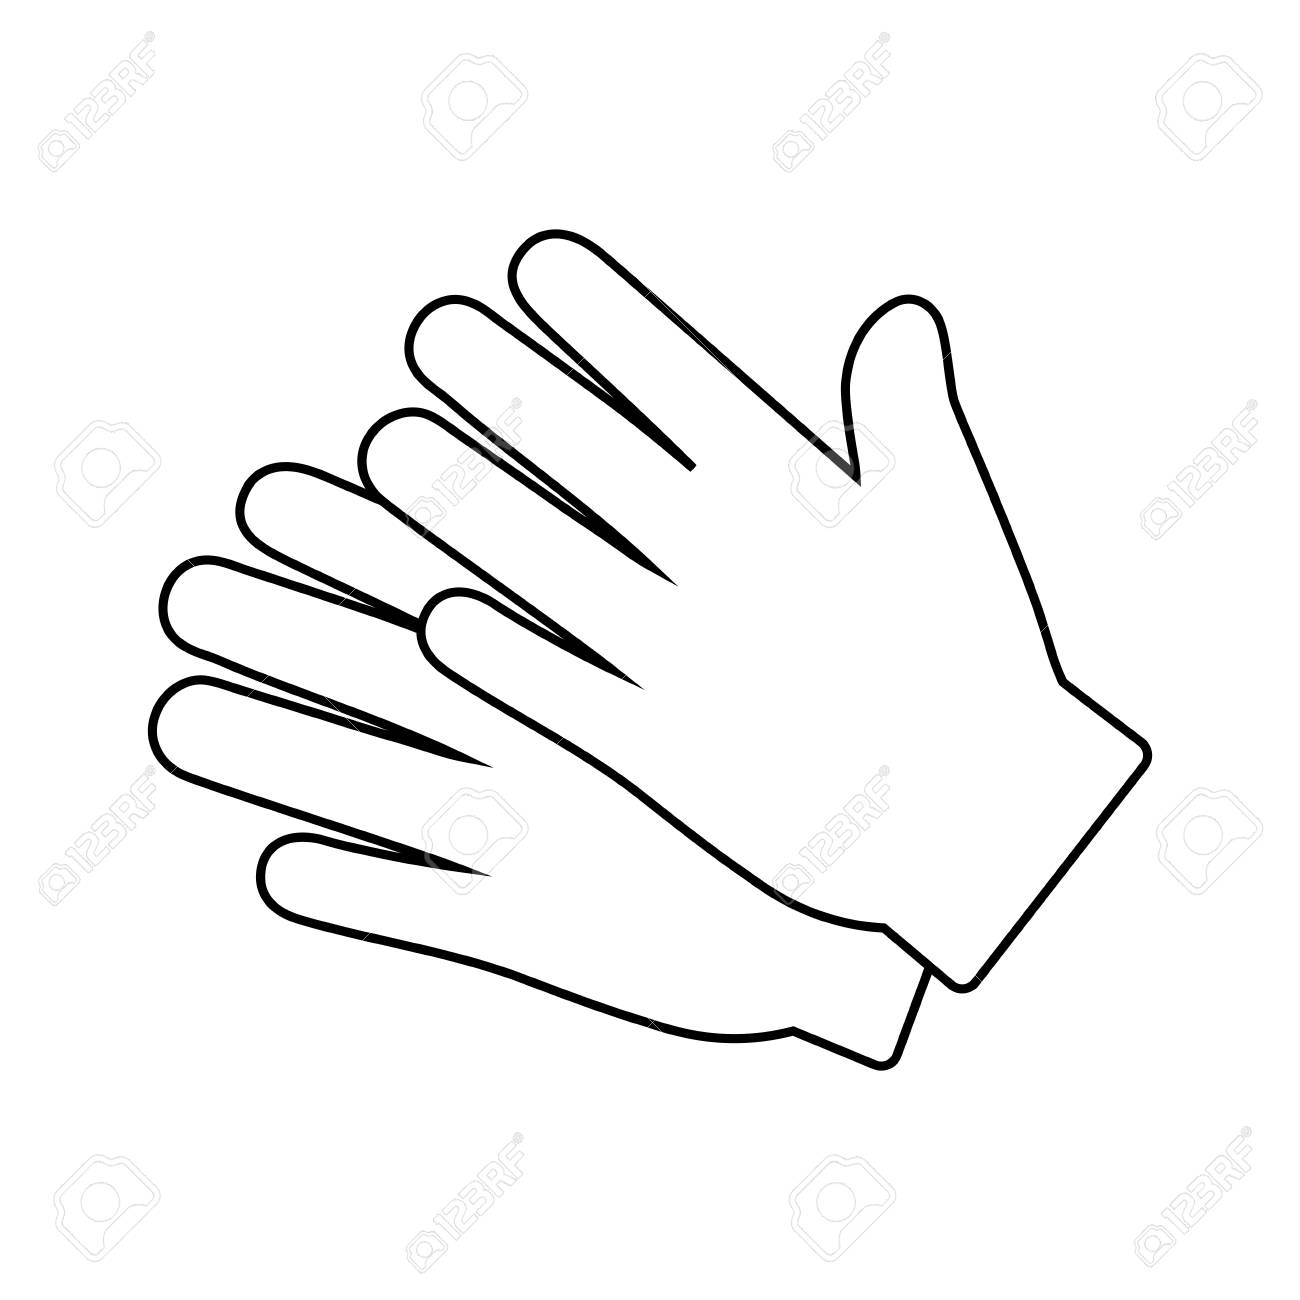 gardening gloves icon over white background. vector illustration